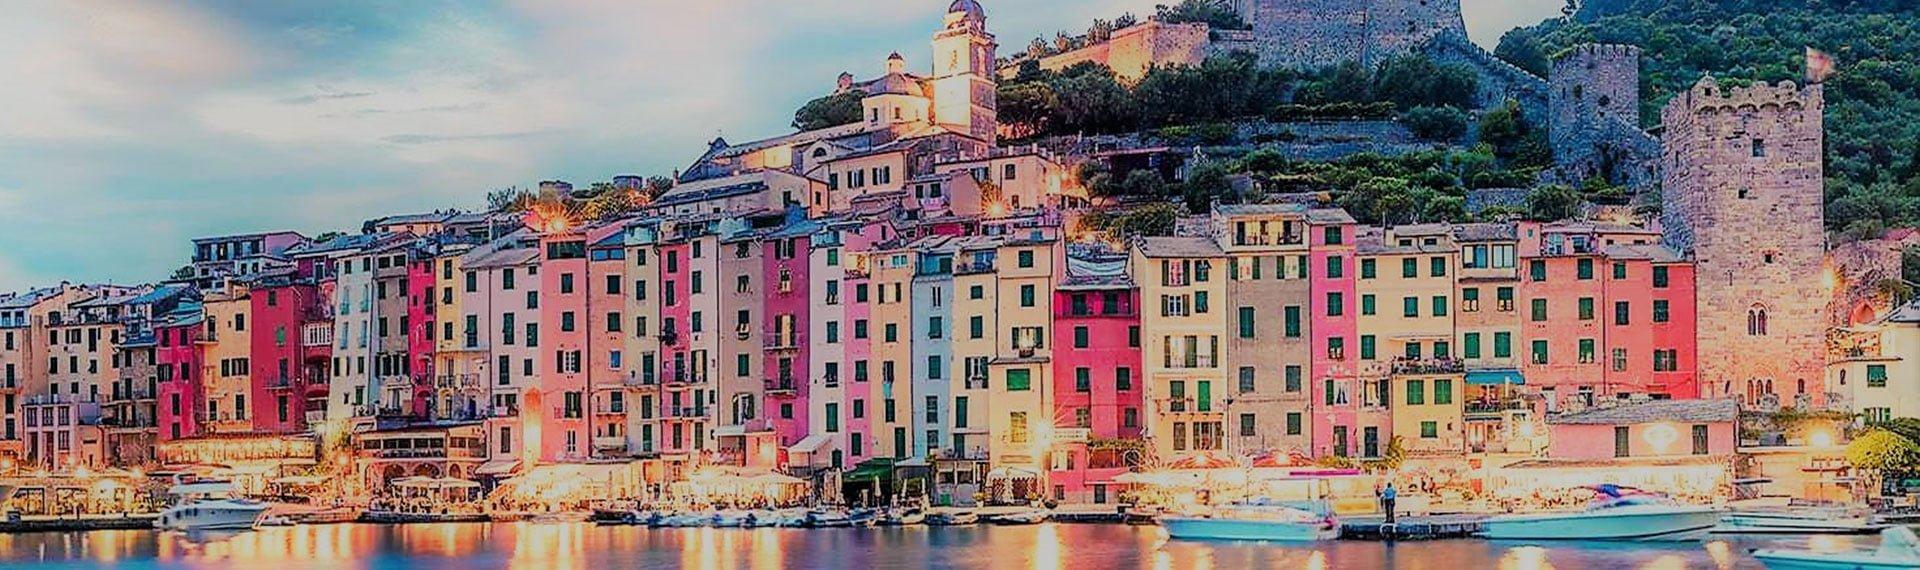 Sup potovanje v Cinque Terre